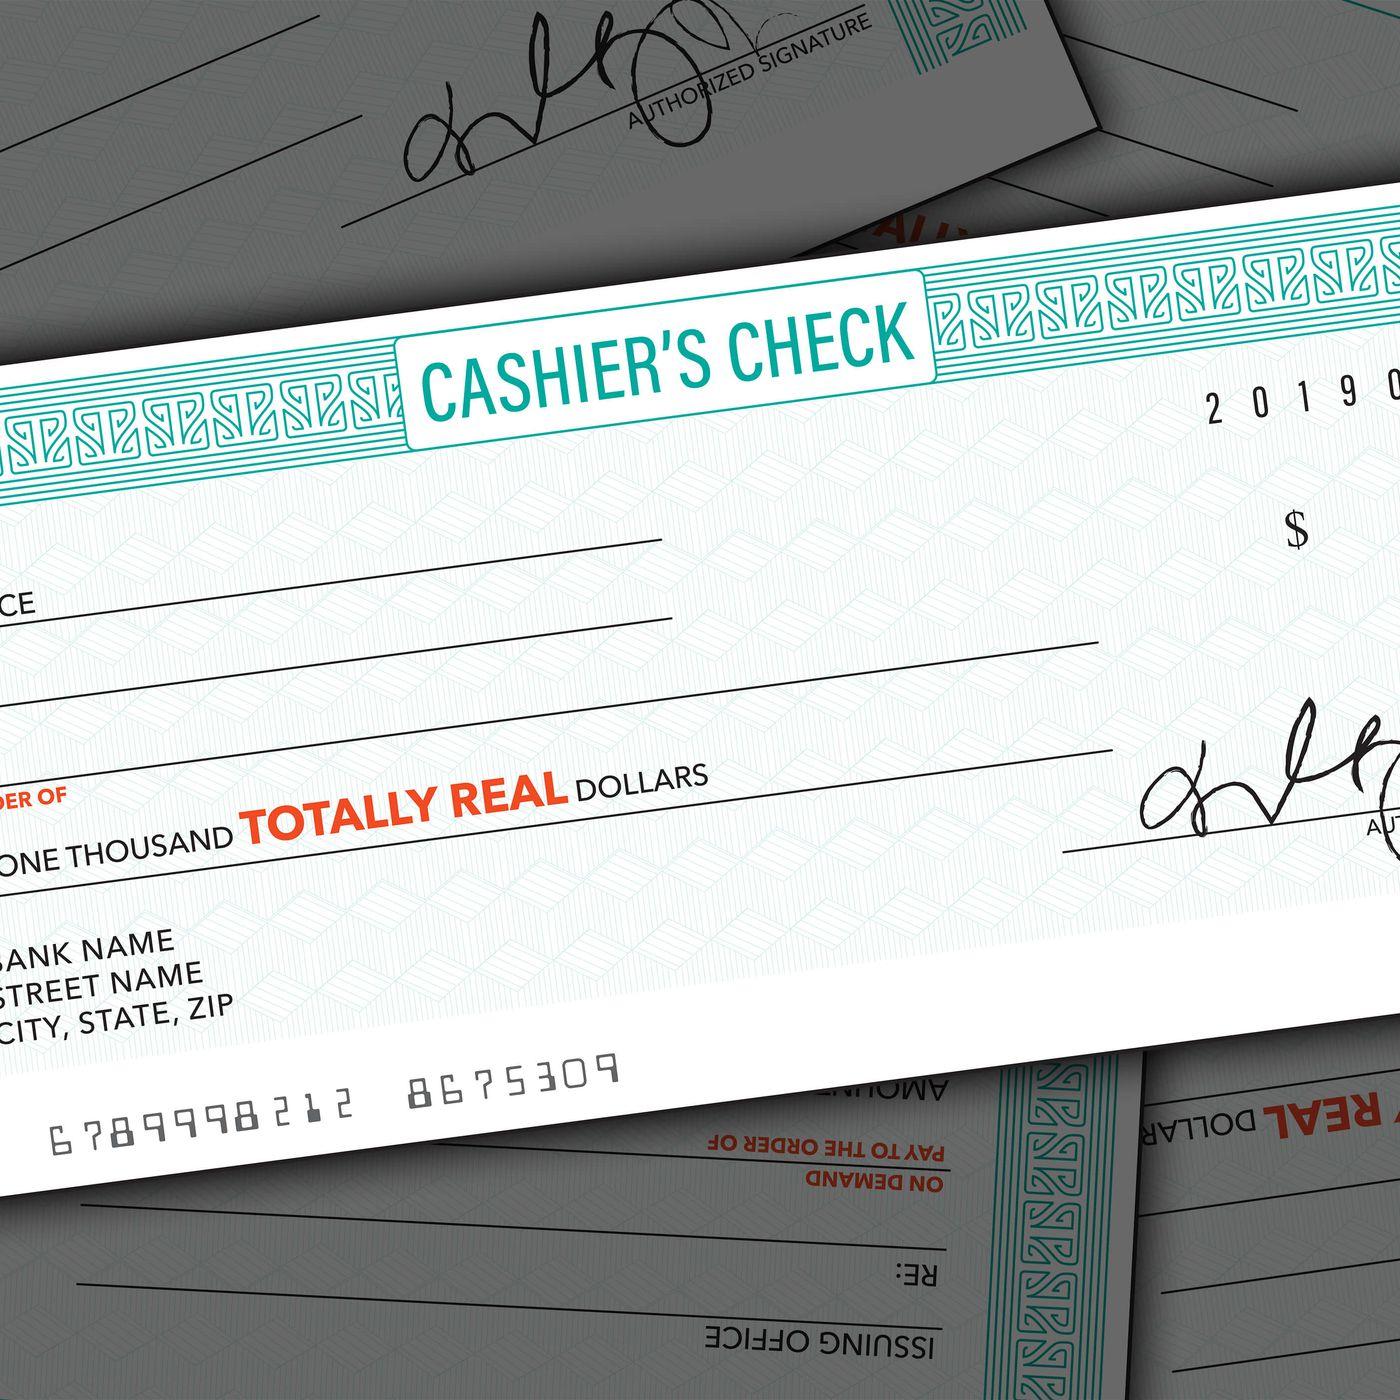 Cashier's check scams on Craigslist, explained - Vox